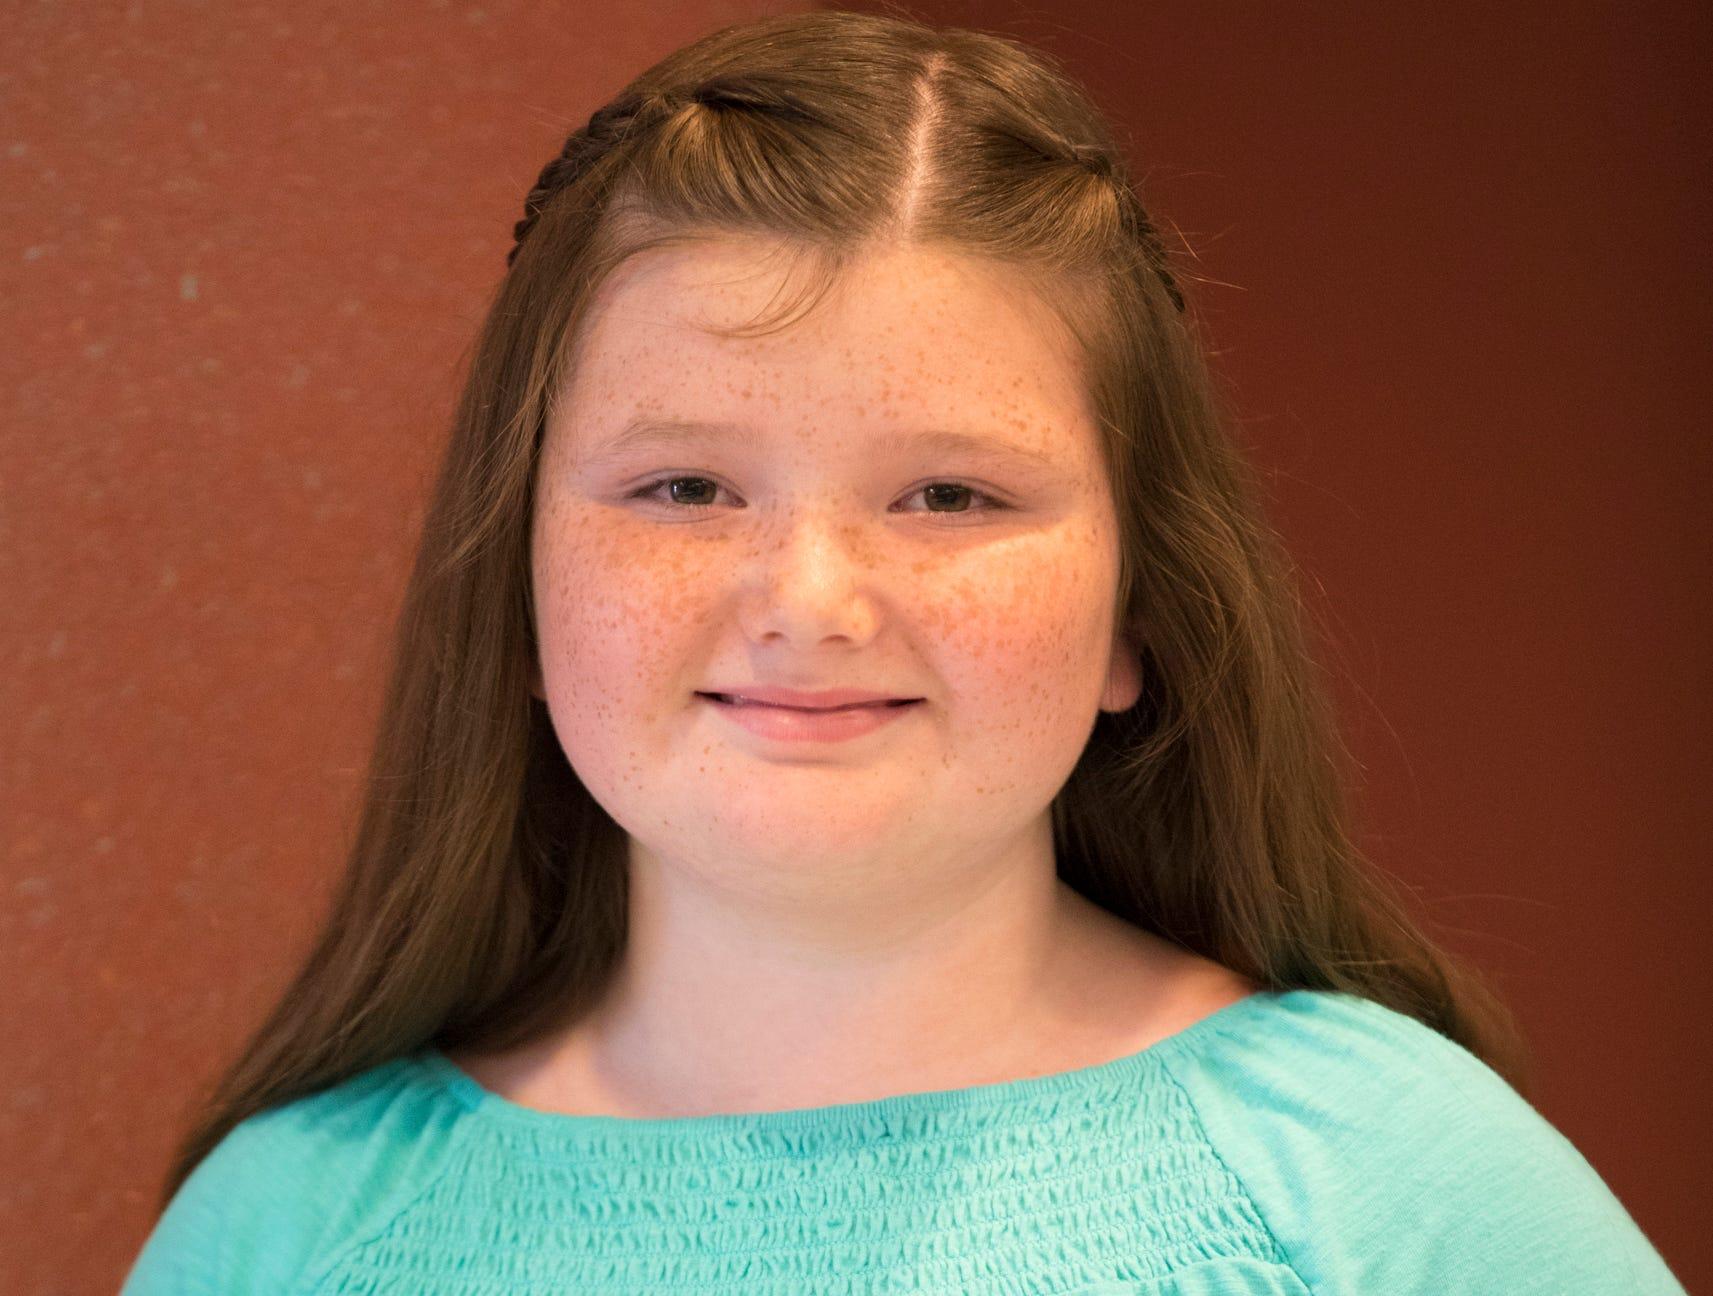 Morgan Johnson, 10, Buckskin Ramblers. Project: Get Started in Art